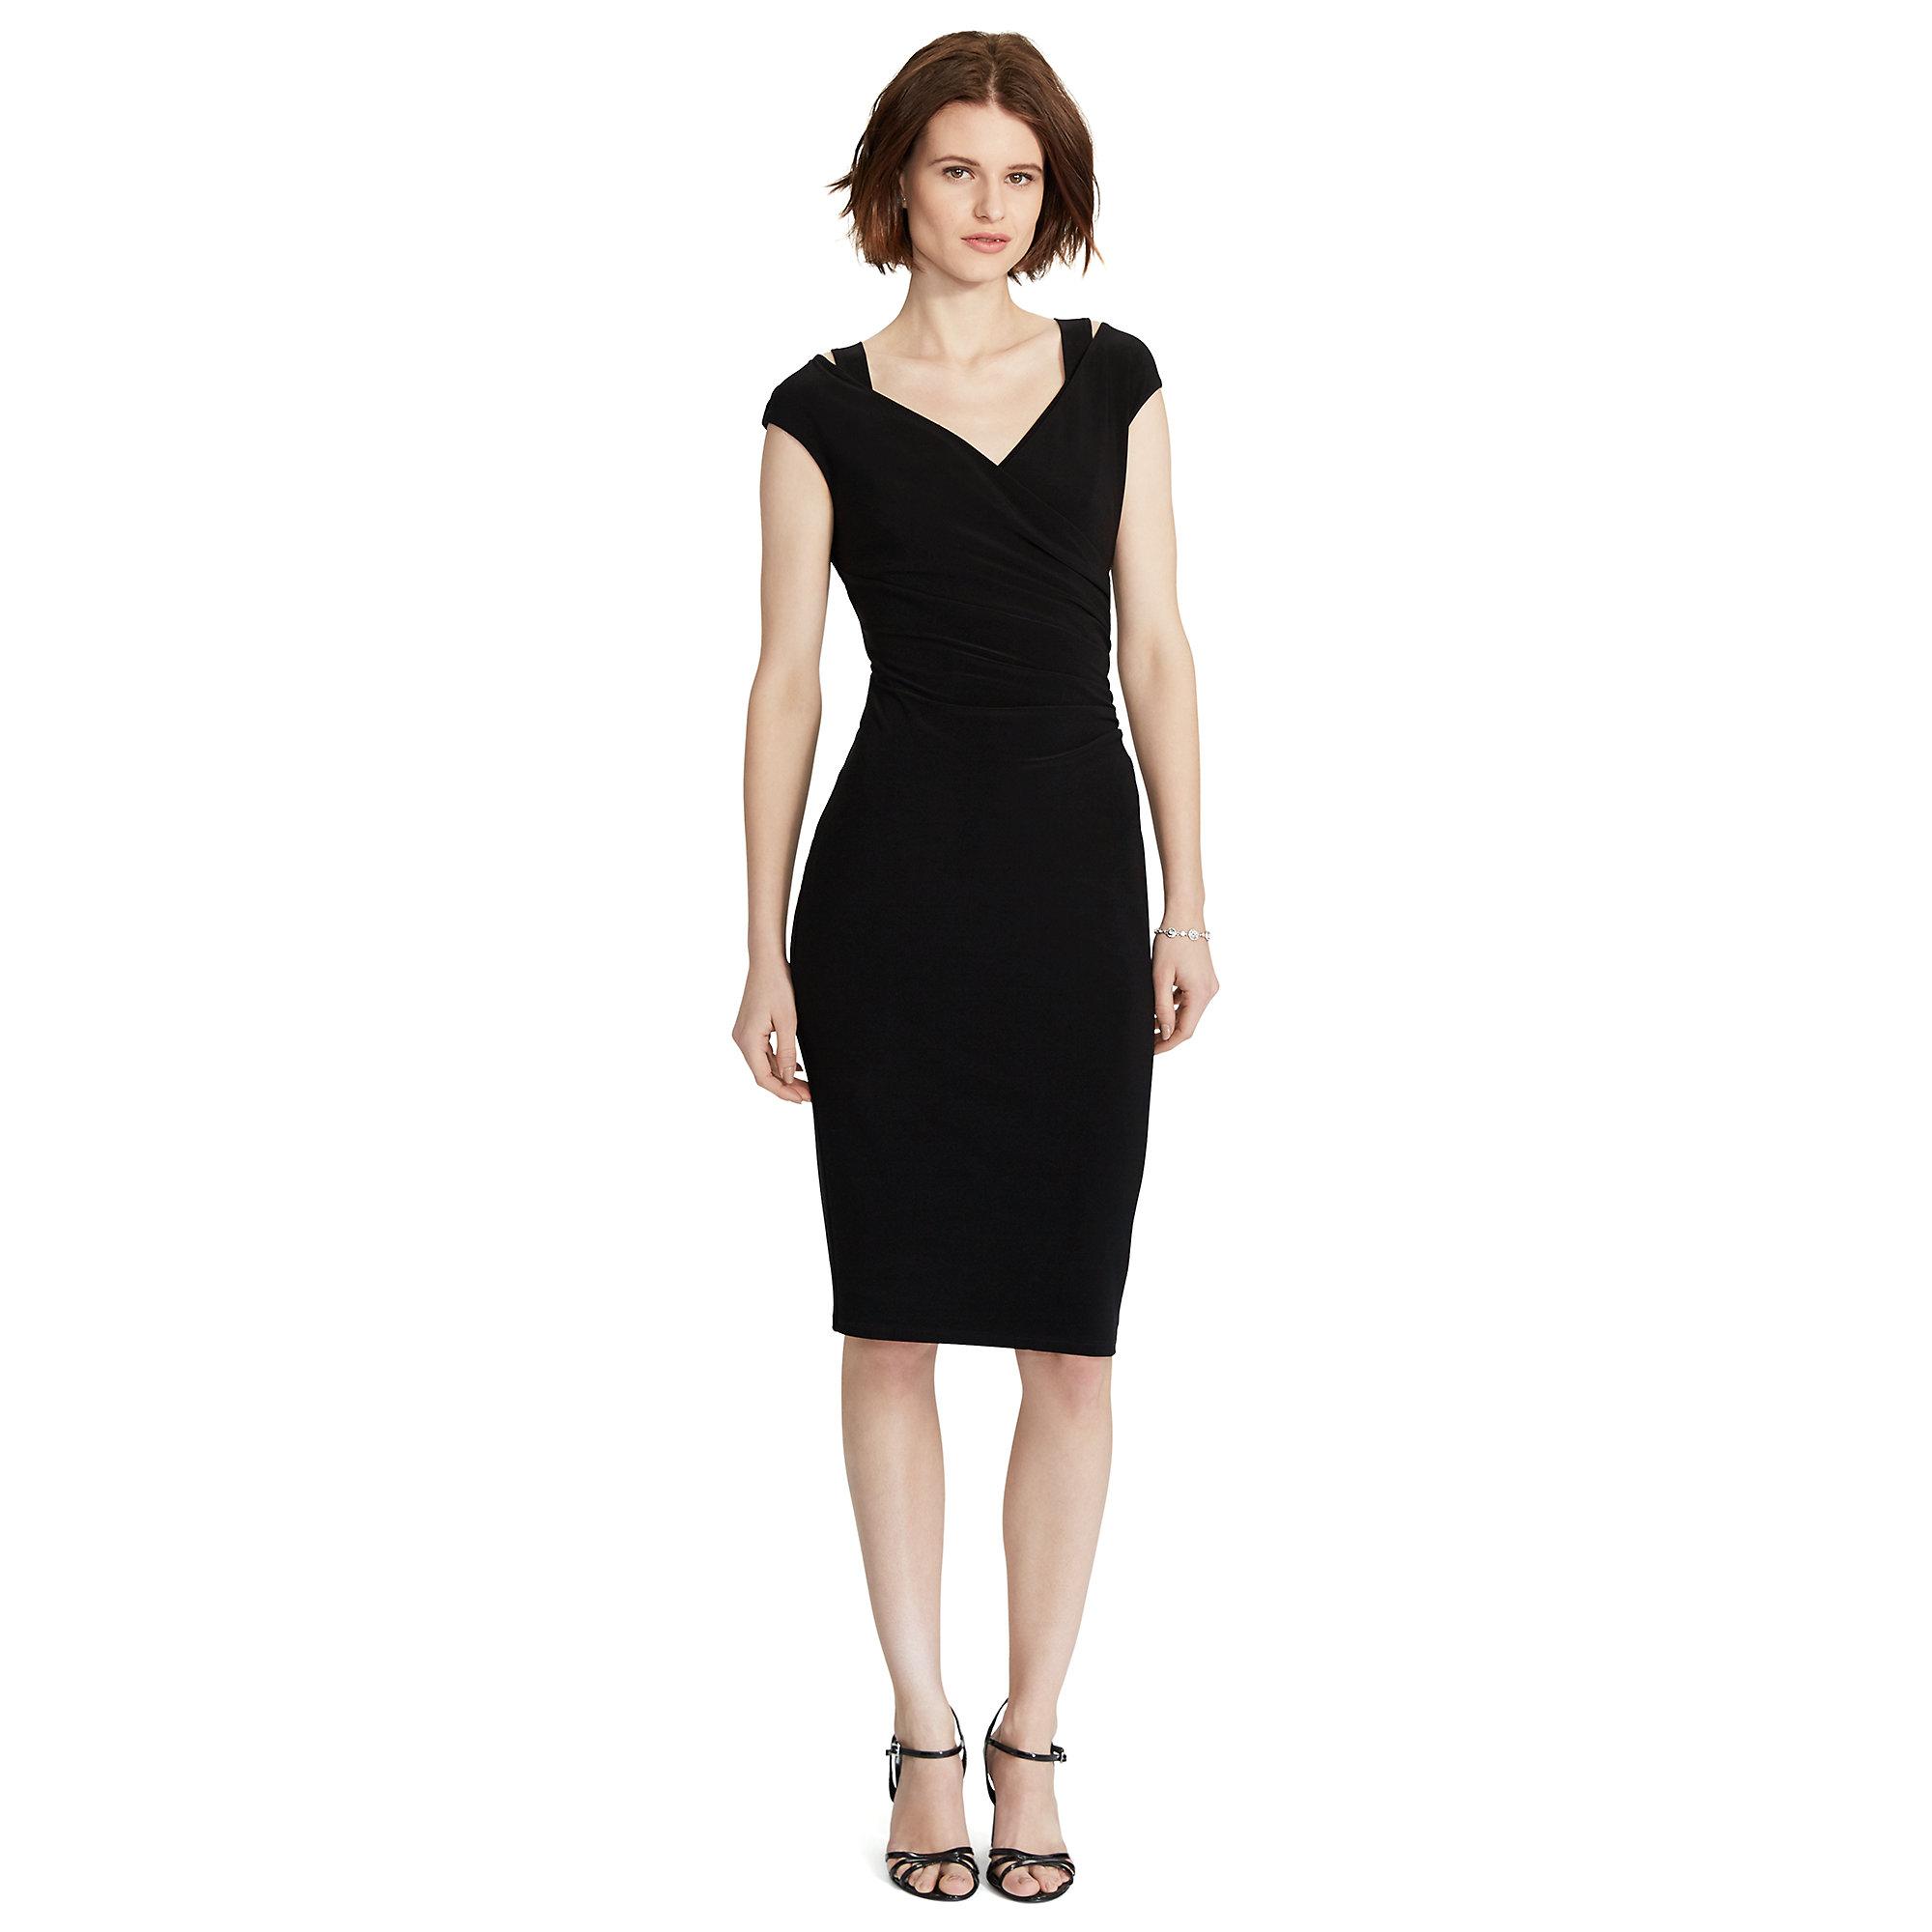 reliable quality a few days away exquisite design Ralph Lauren Dress Black   Weddings Dresses